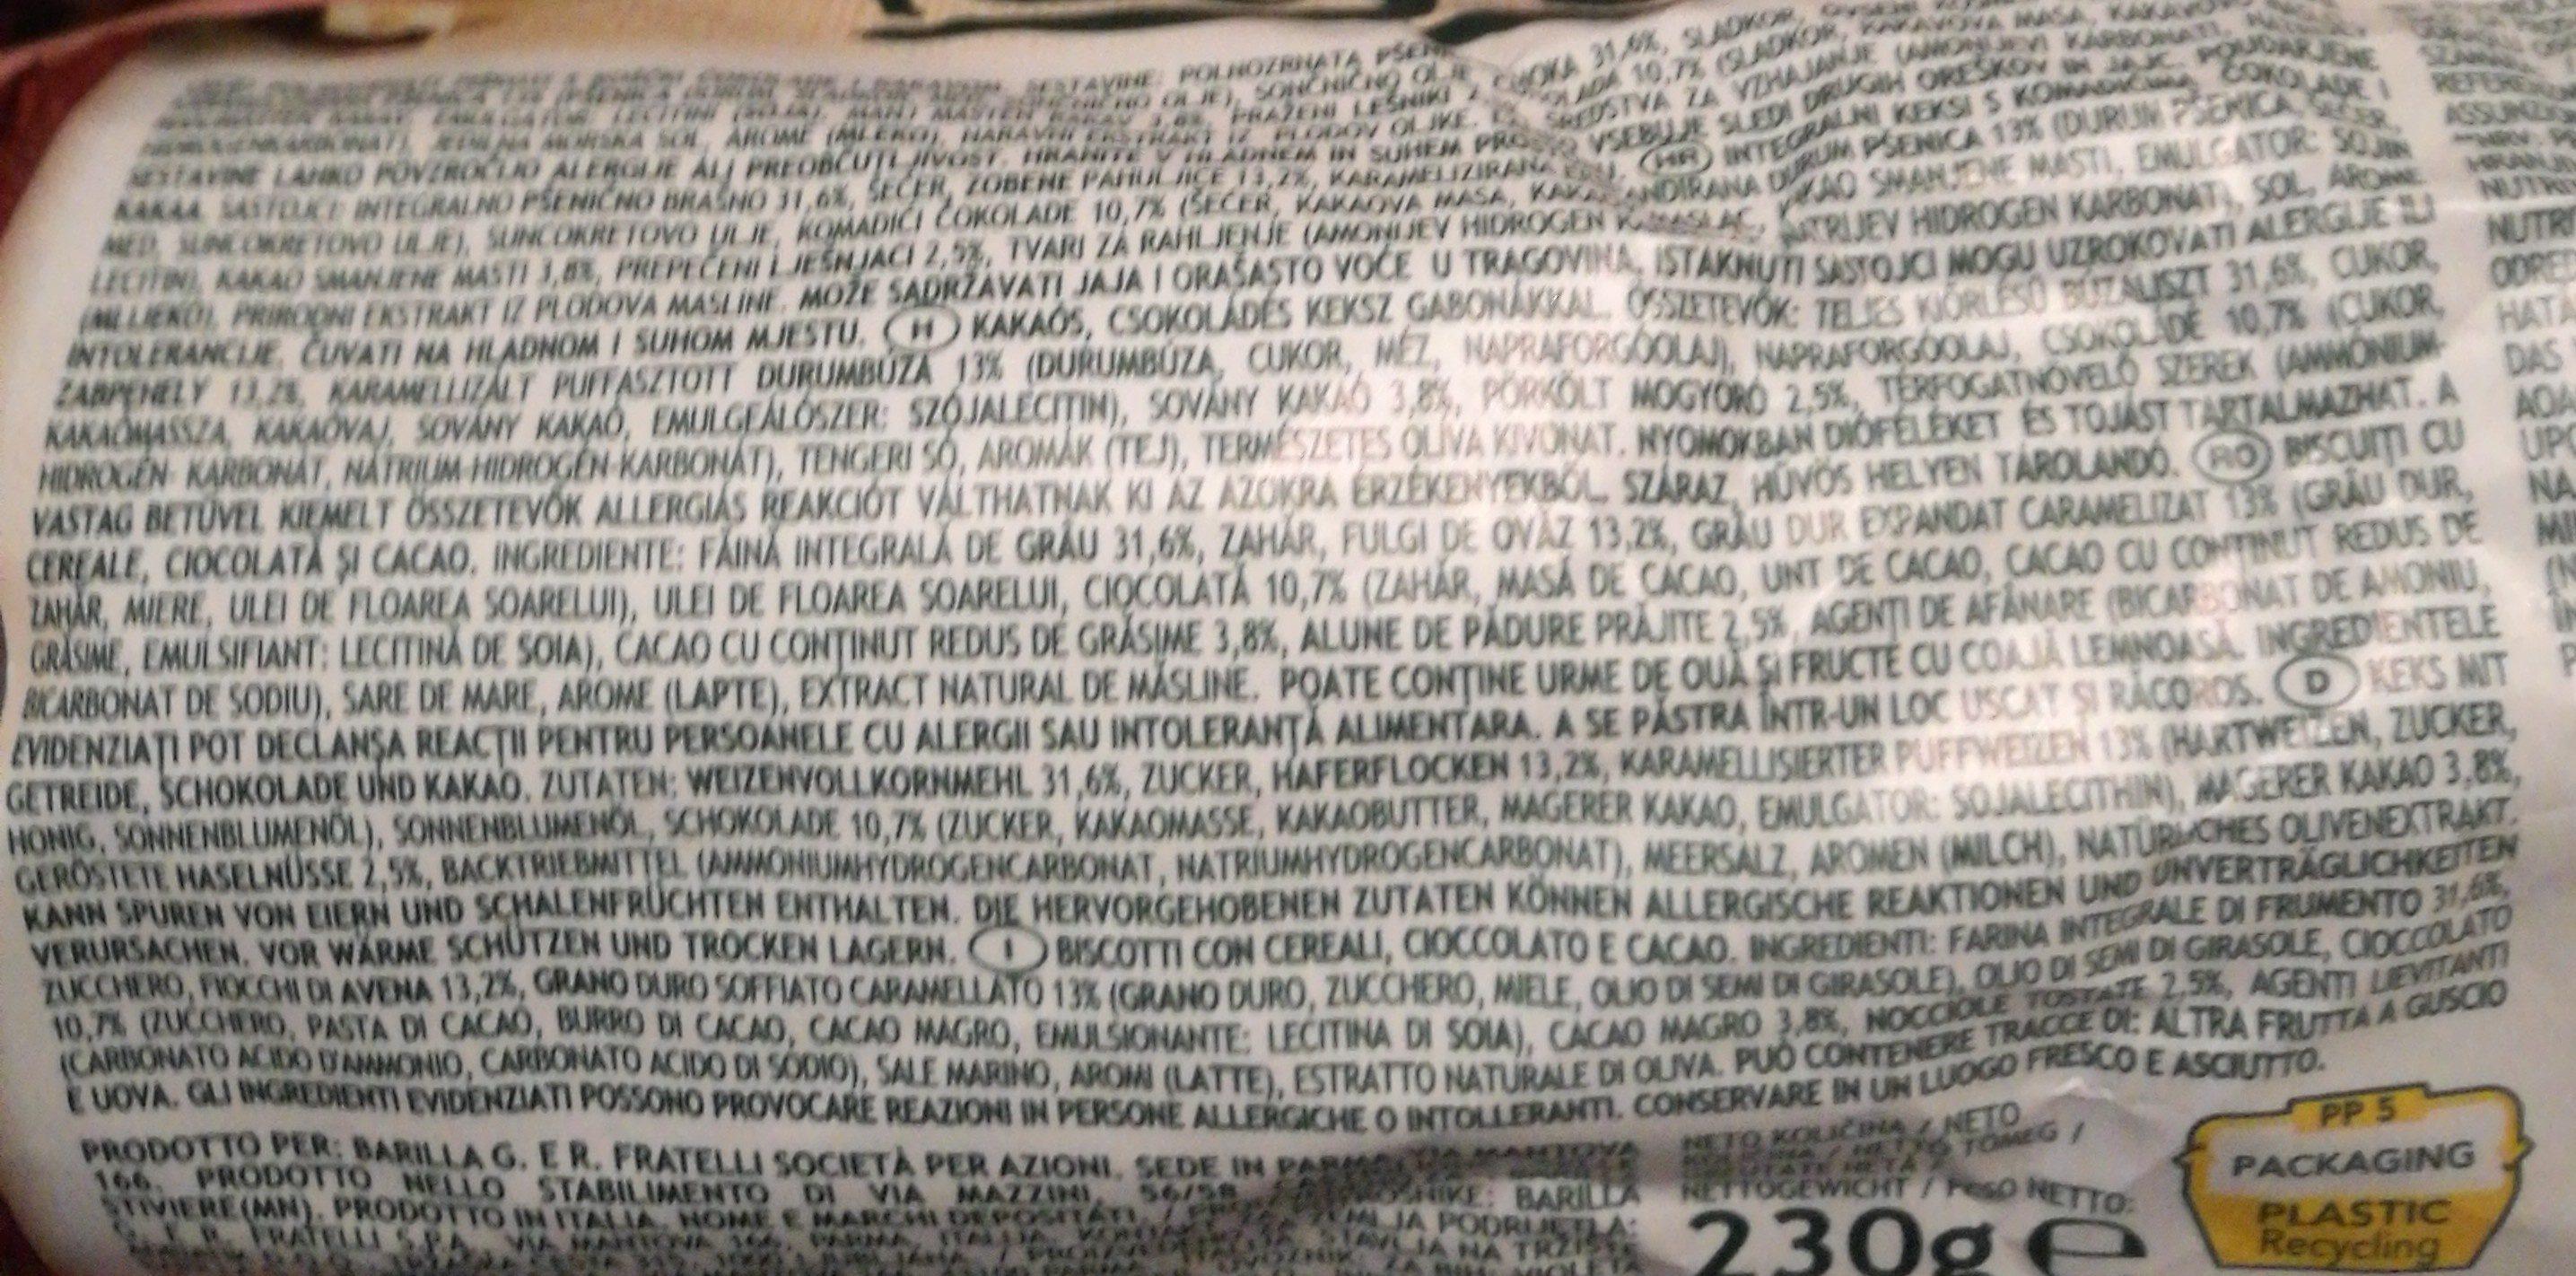 Gran Cereale Cacao - Ingrédients